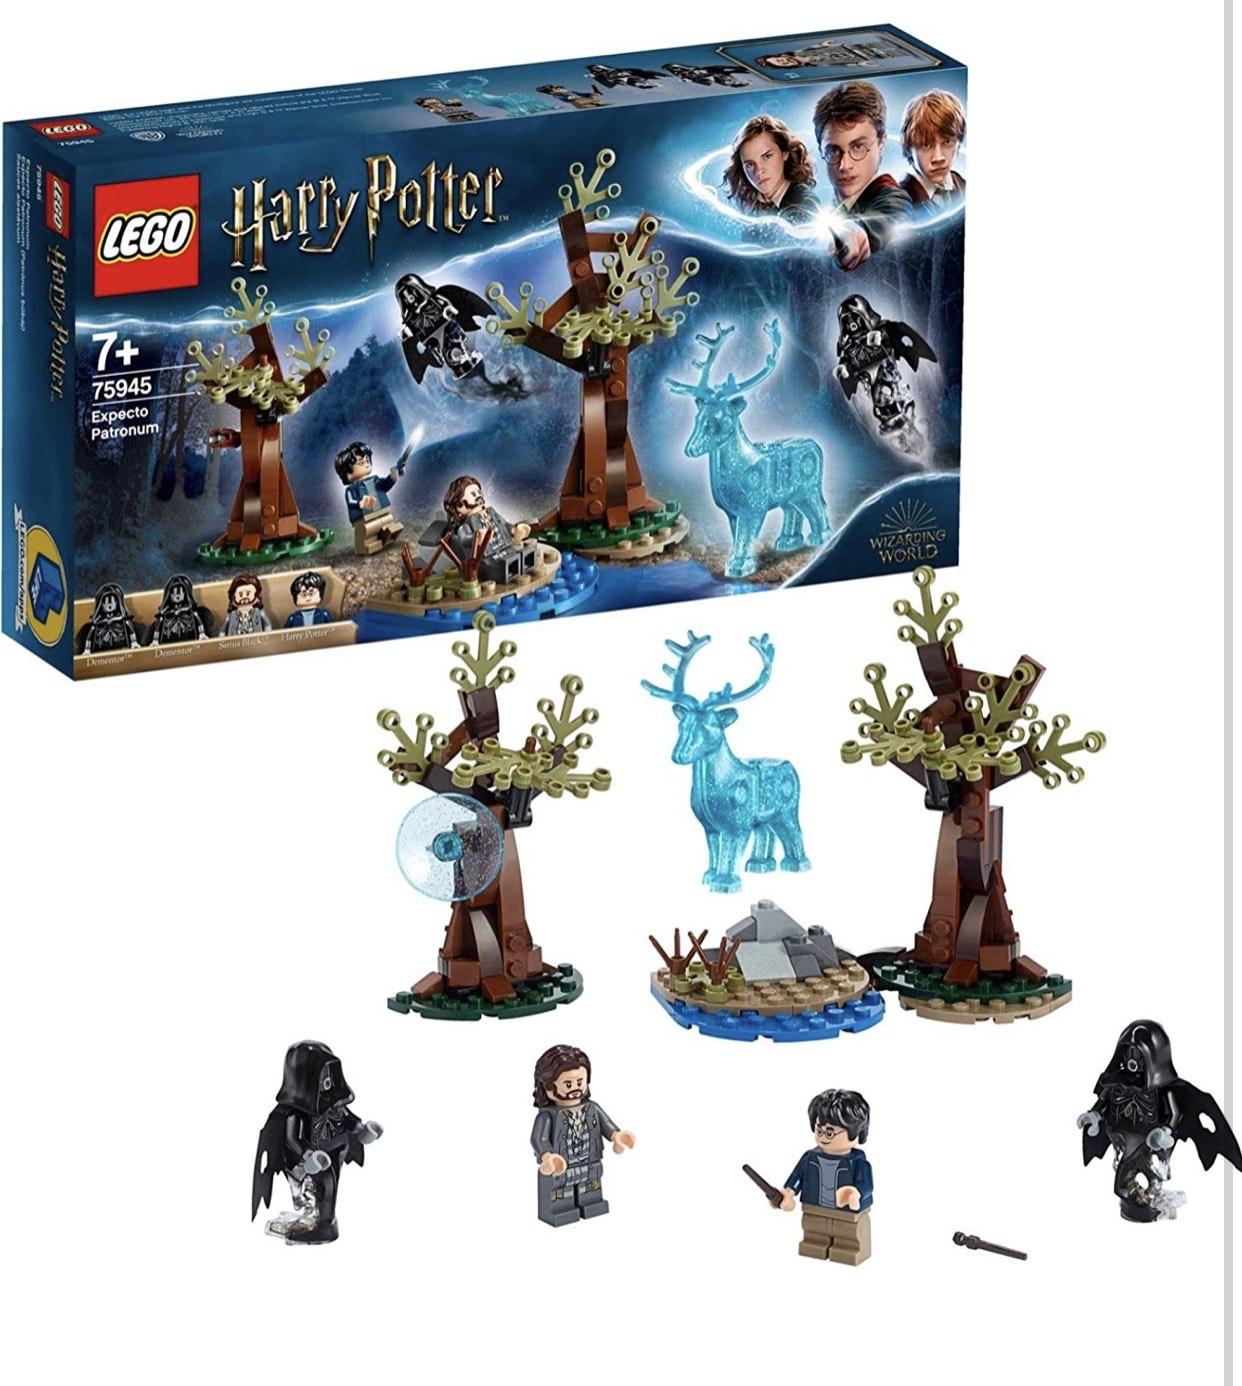 Lego Harry Potter - Expecto Patronum (75945) al 50%